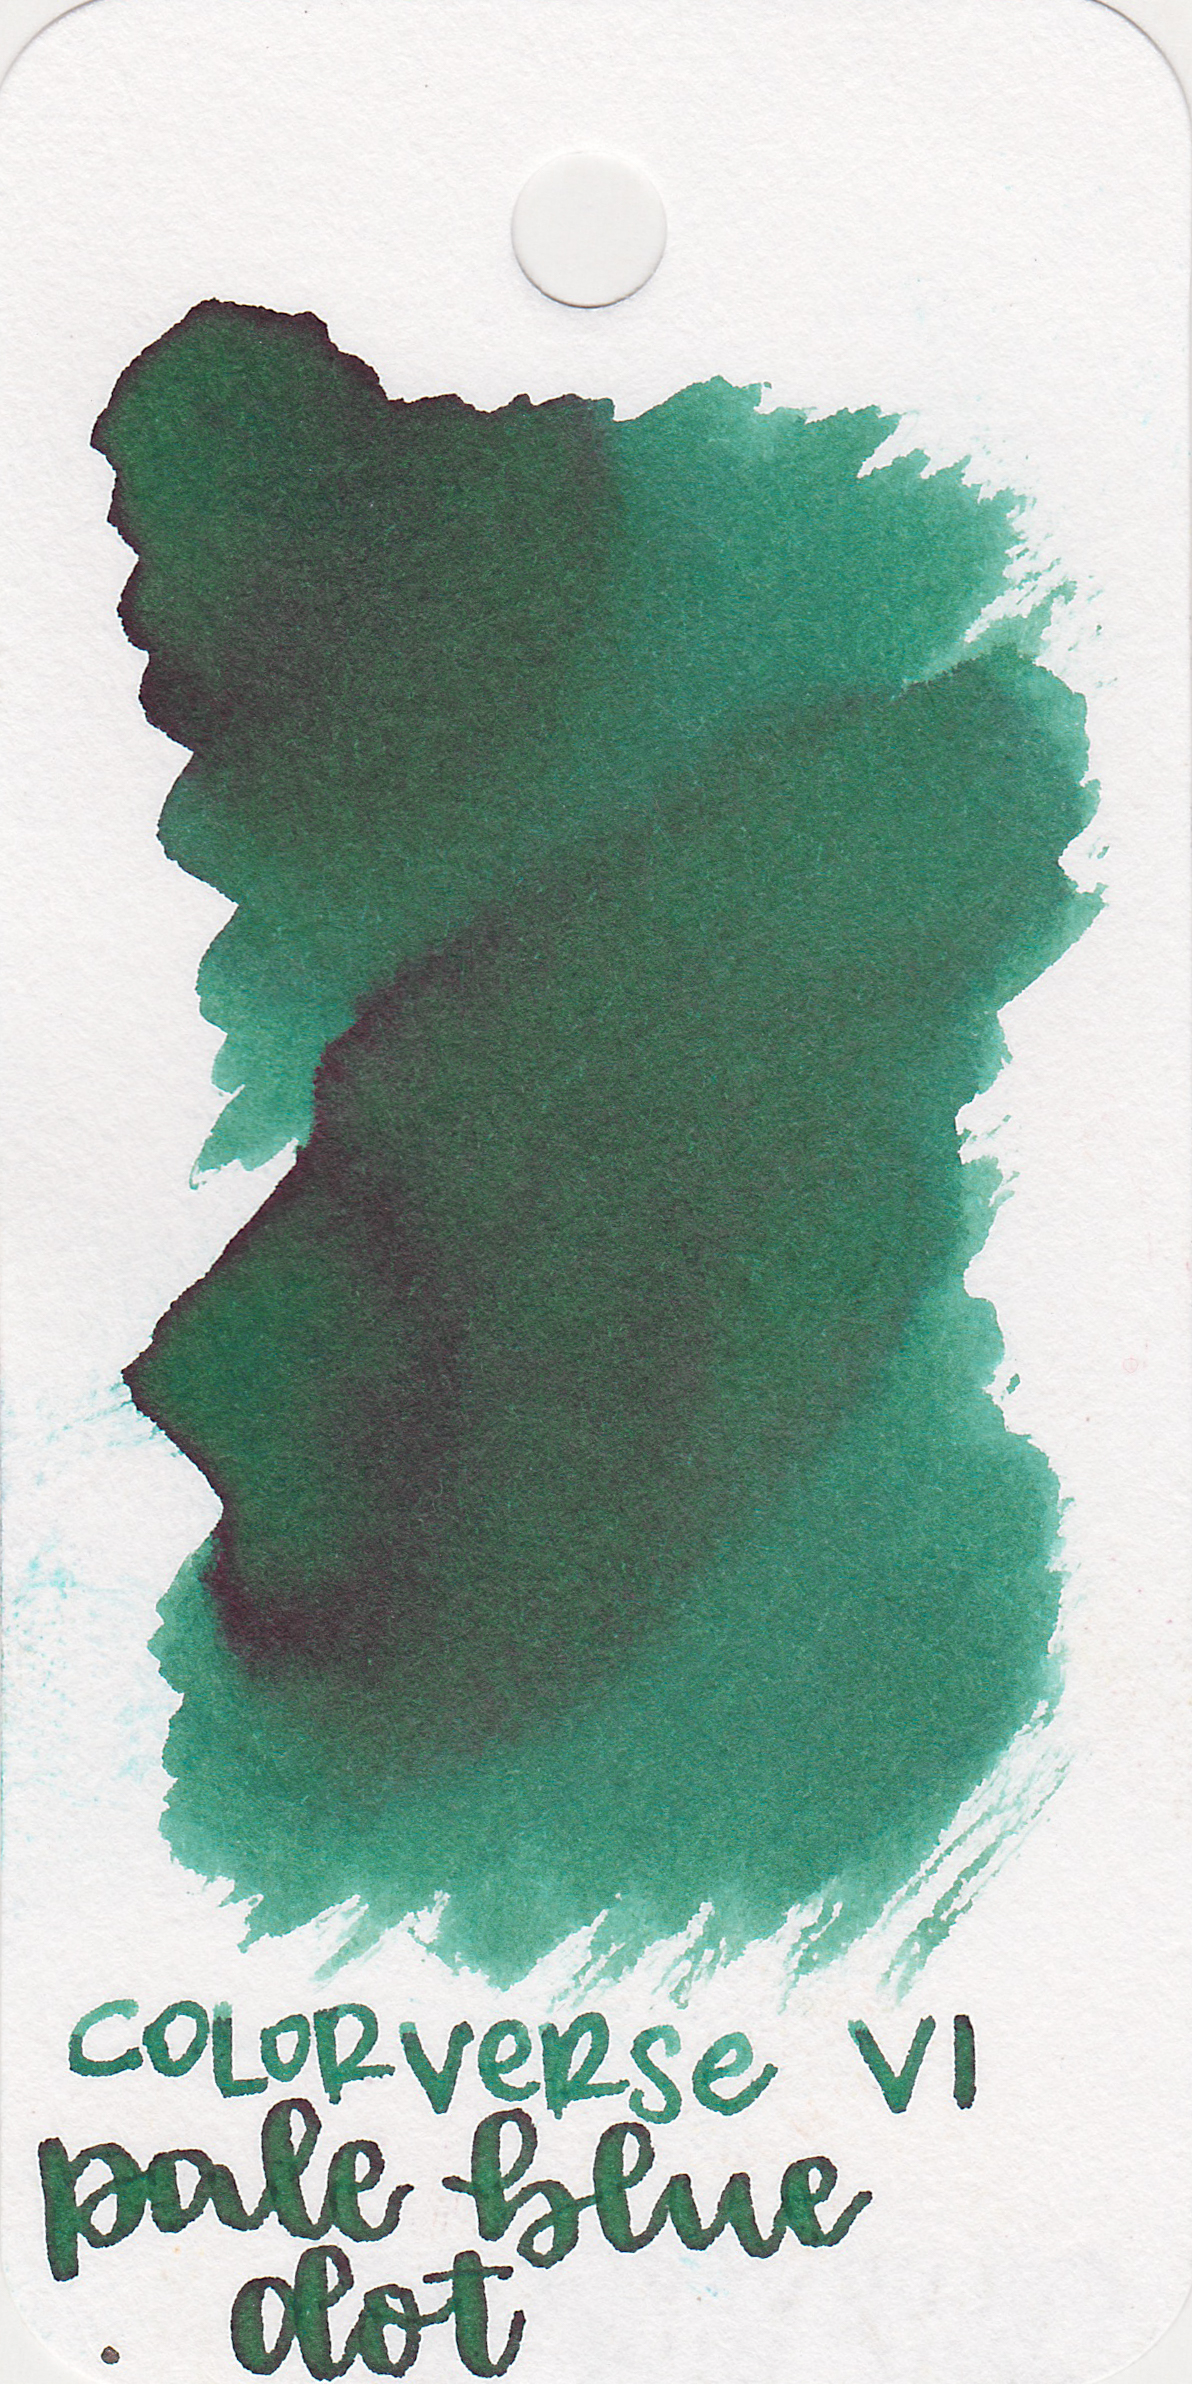 cv-pale-blue-dot-1.jpg